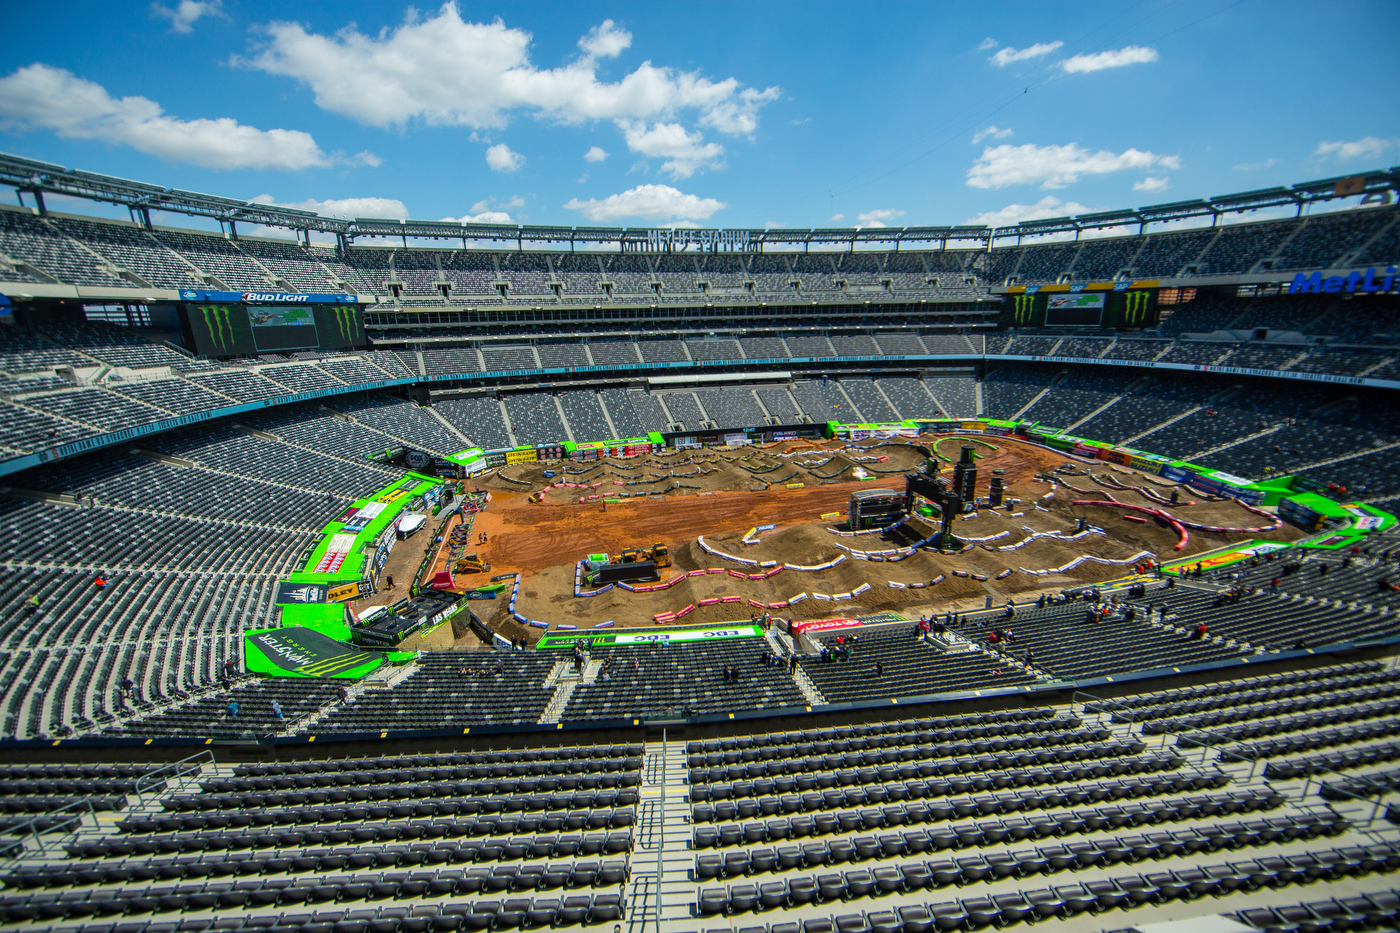 Image of Met Life New York Supercross track